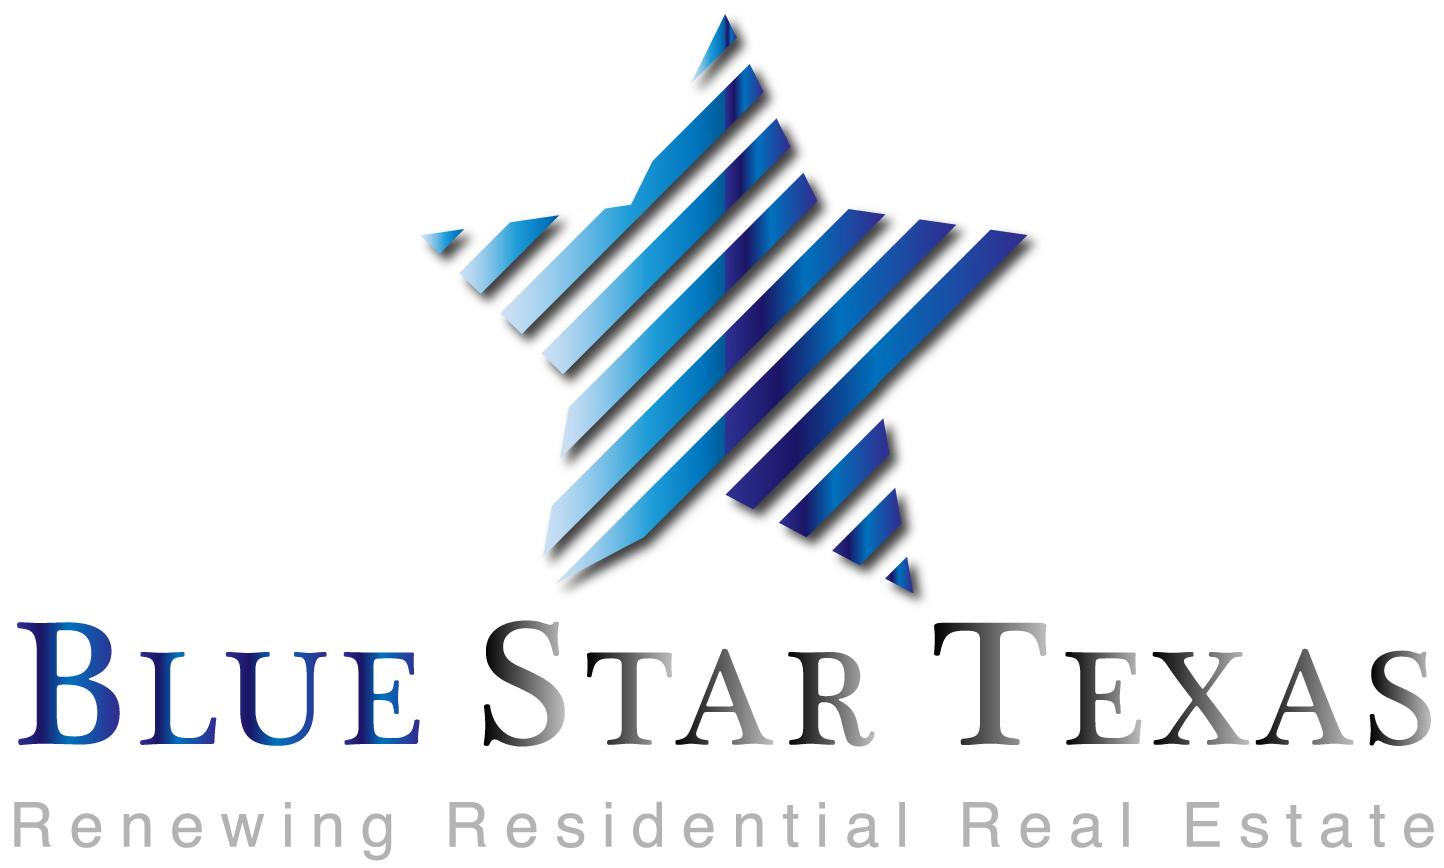 Blue Star Texas